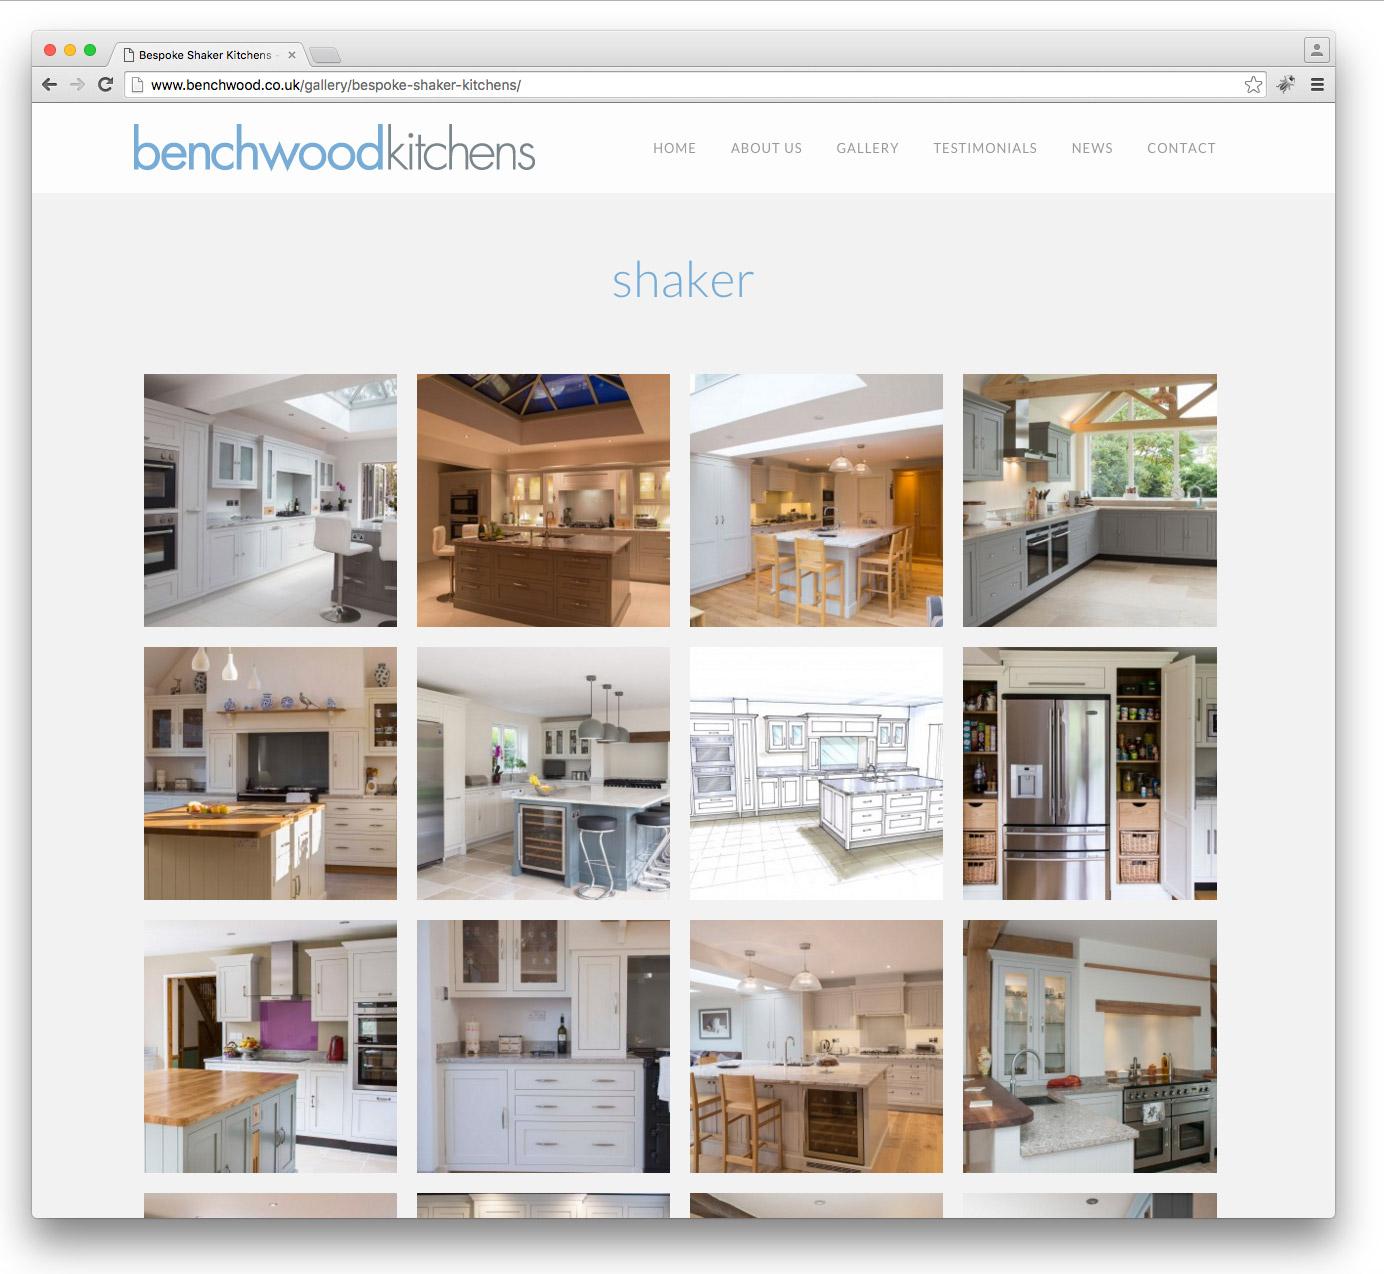 Benchwood Kitchens